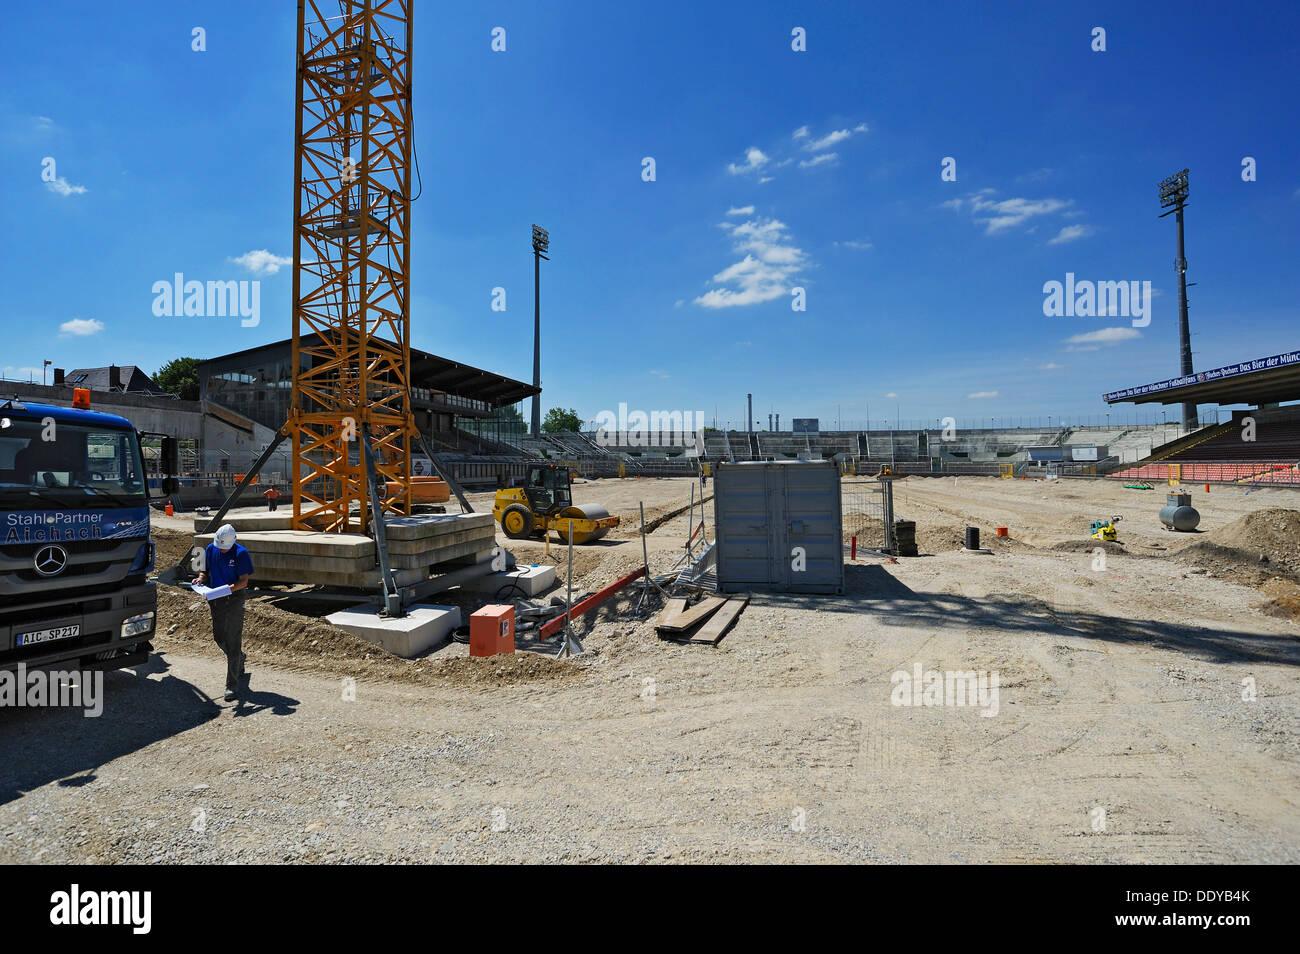 Reconstruction of the Gruenwalder Stadion stadium in Munich, Bavaria - Stock Image